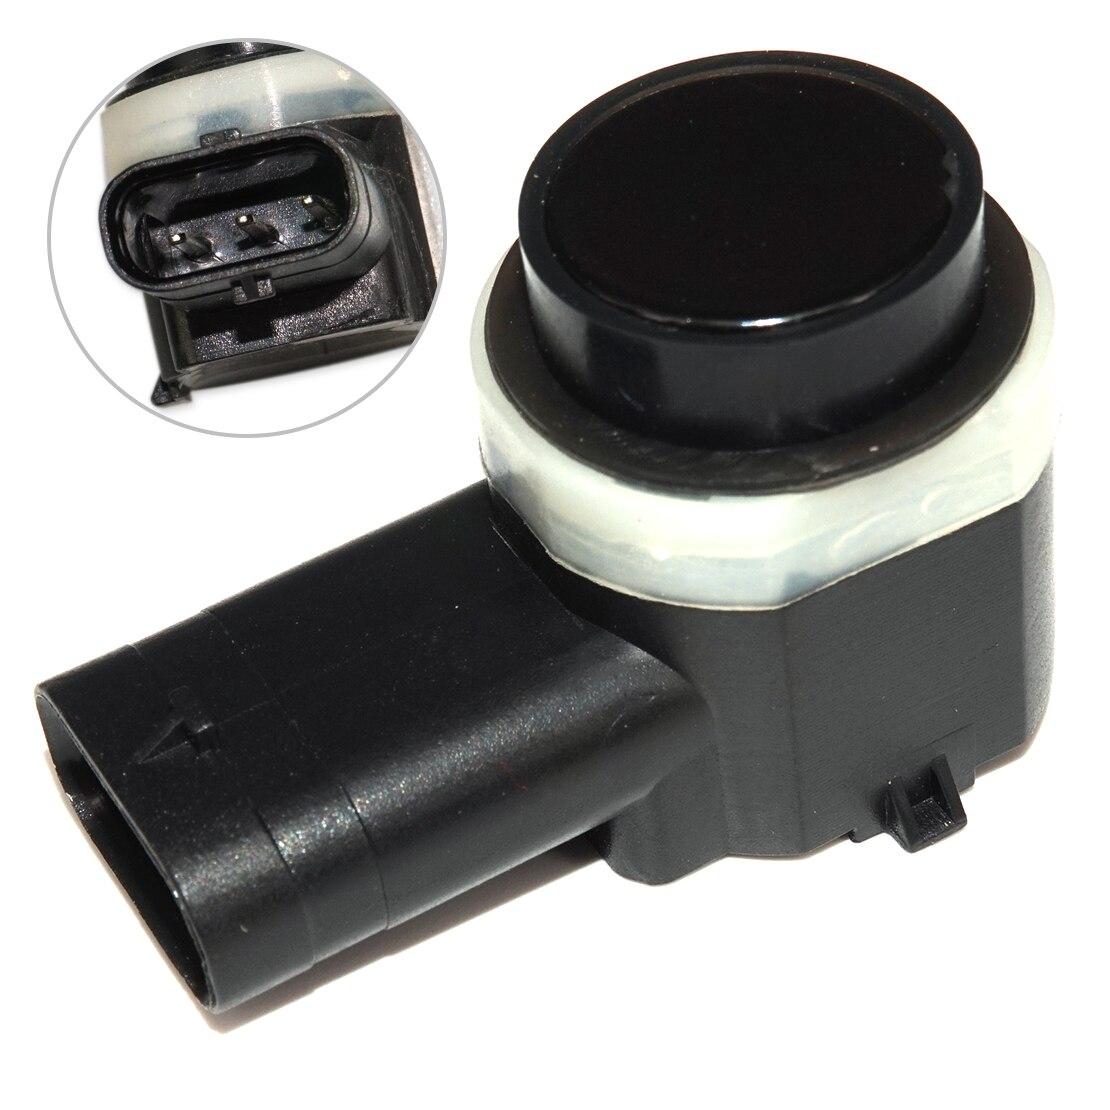 beler 1Pc PDC Parking Sensor 3C0919275L 5K0919275 Fit for VW Golf Jetta Passat CC Touran Tiguan EOS Touareg Polo Transporter